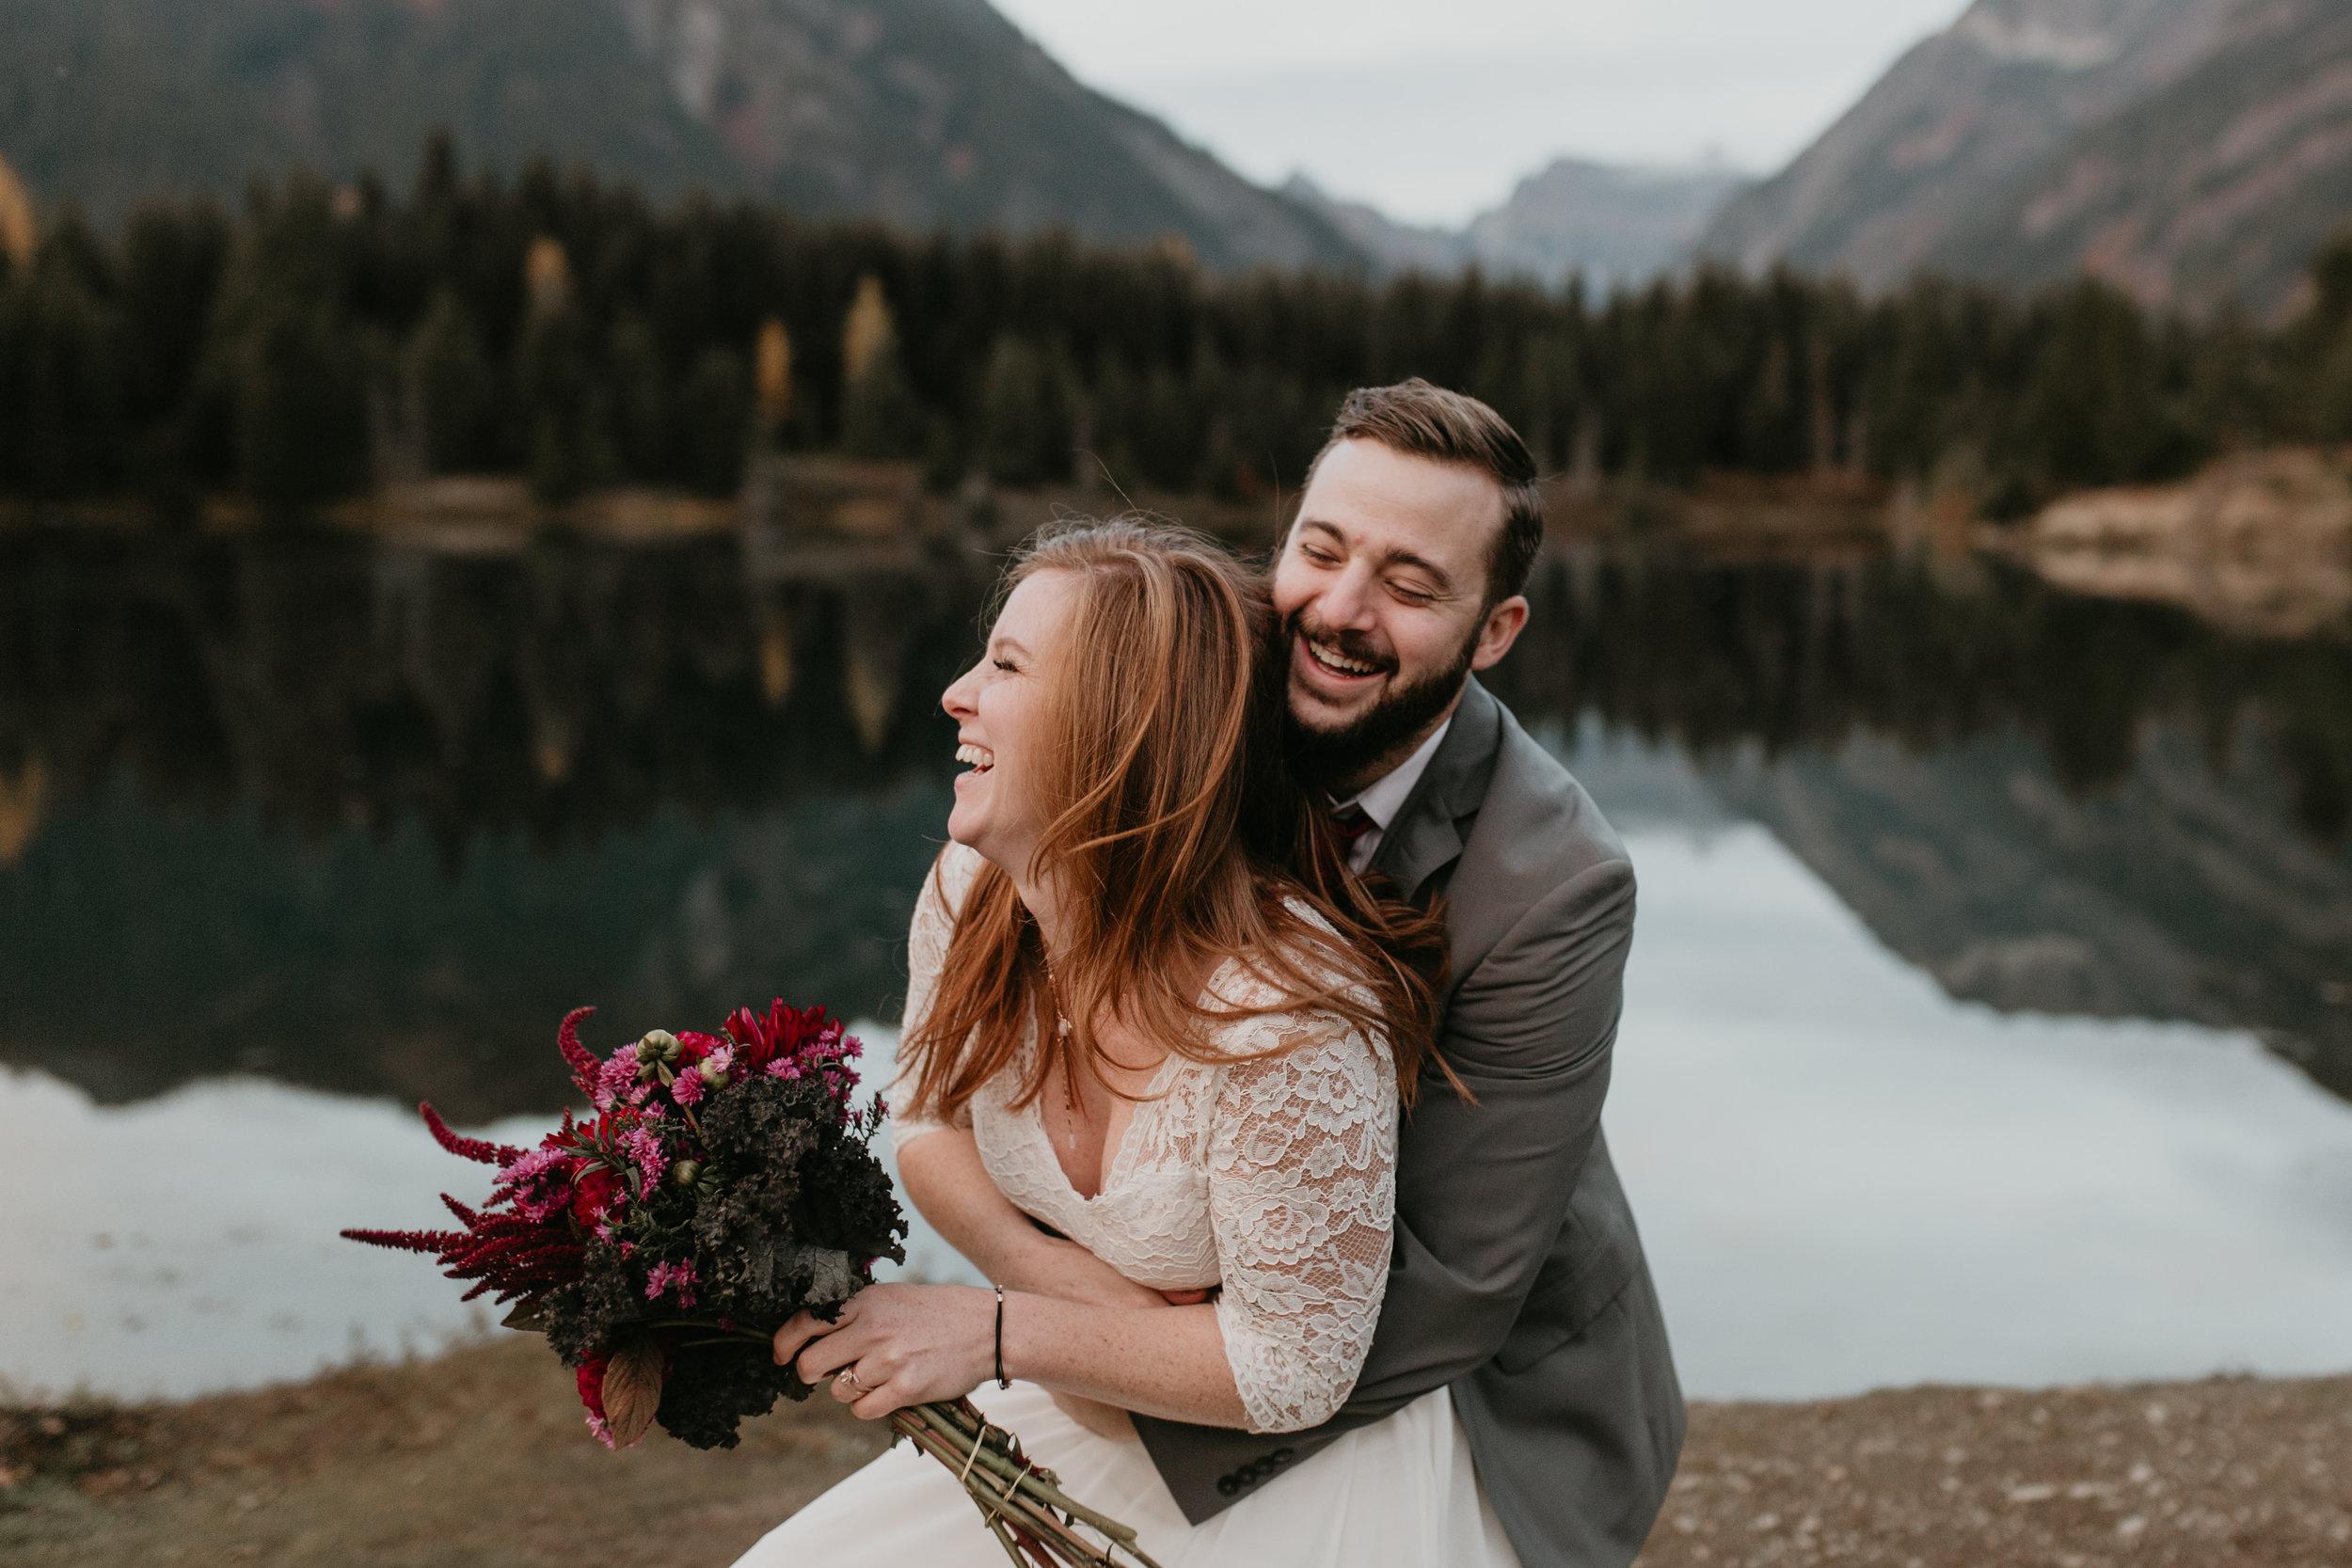 nicole-daacke-photography-mountain-view-elopement-at-gold-creek-pond-snoqualmie-washington-wa-elopement-photographer-photography-adventure-elopement-in-washington-fall-lakeside-golden-sunset-boho-fun-bride-0628.jpg